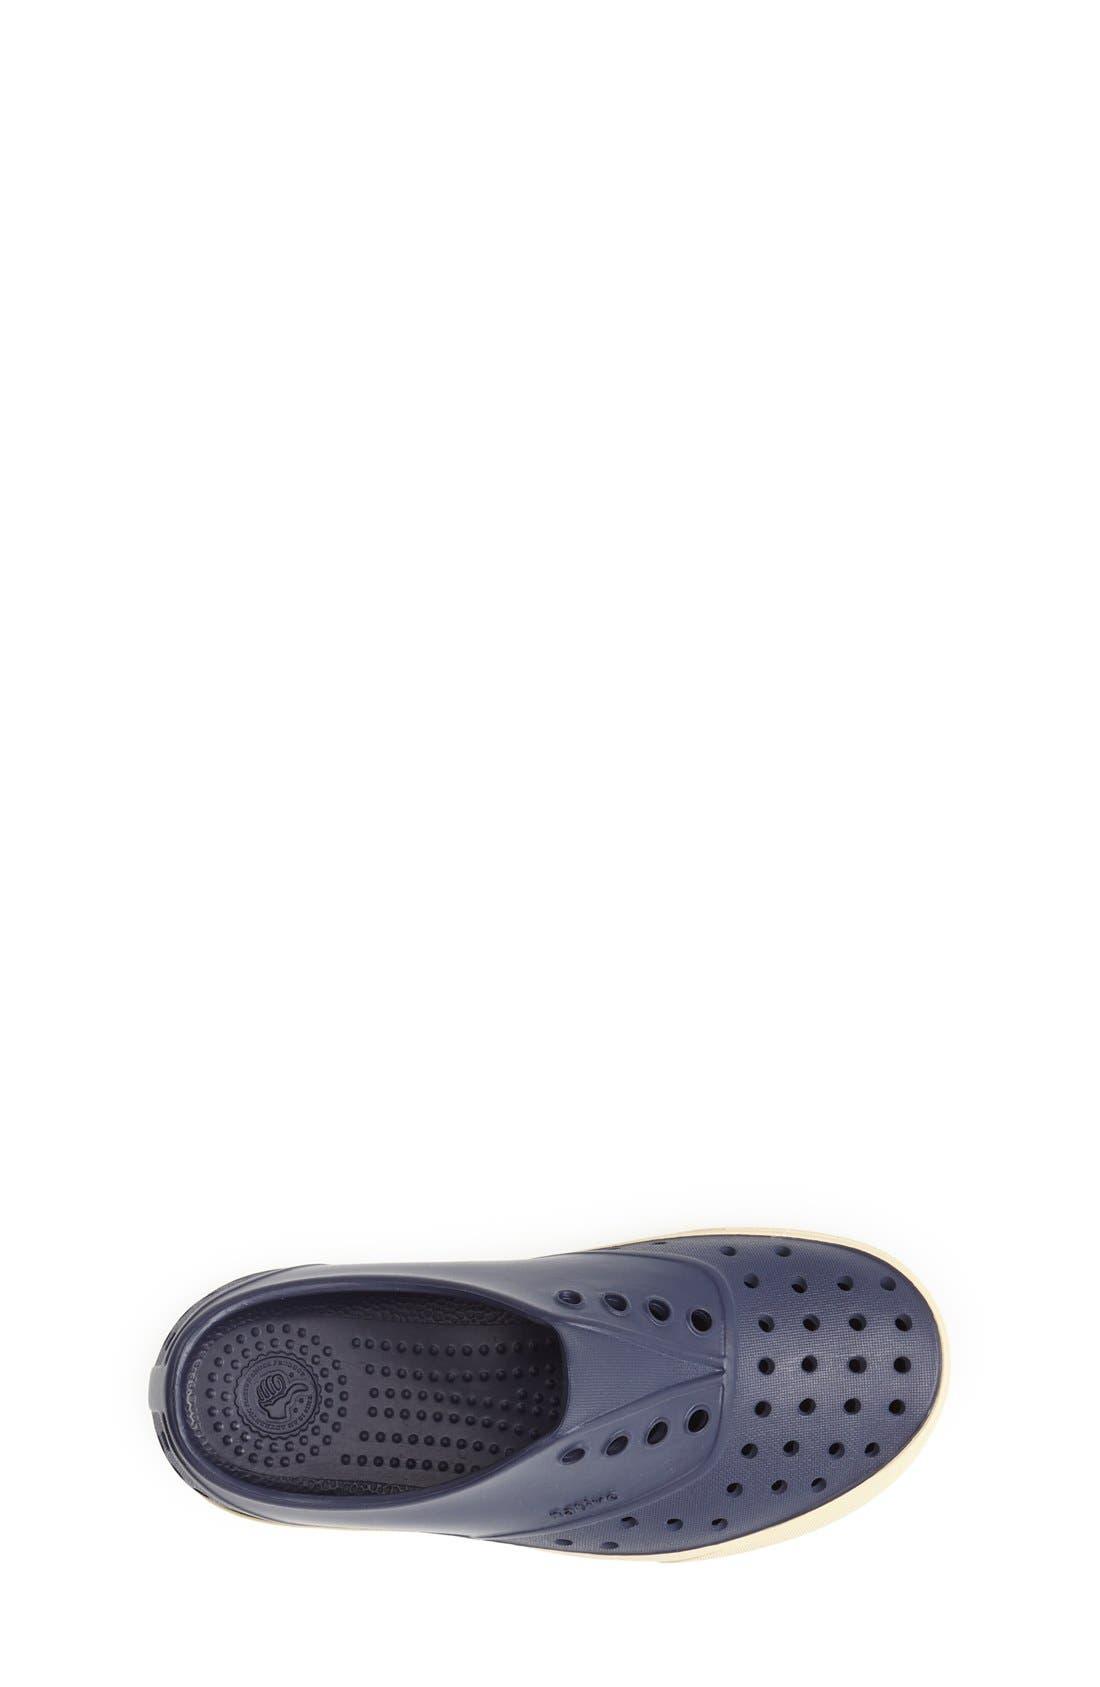 Alternate Image 3  - Native Shoes 'Miller' Slip-On (Baby, Walker, Toddler & Little Kid)